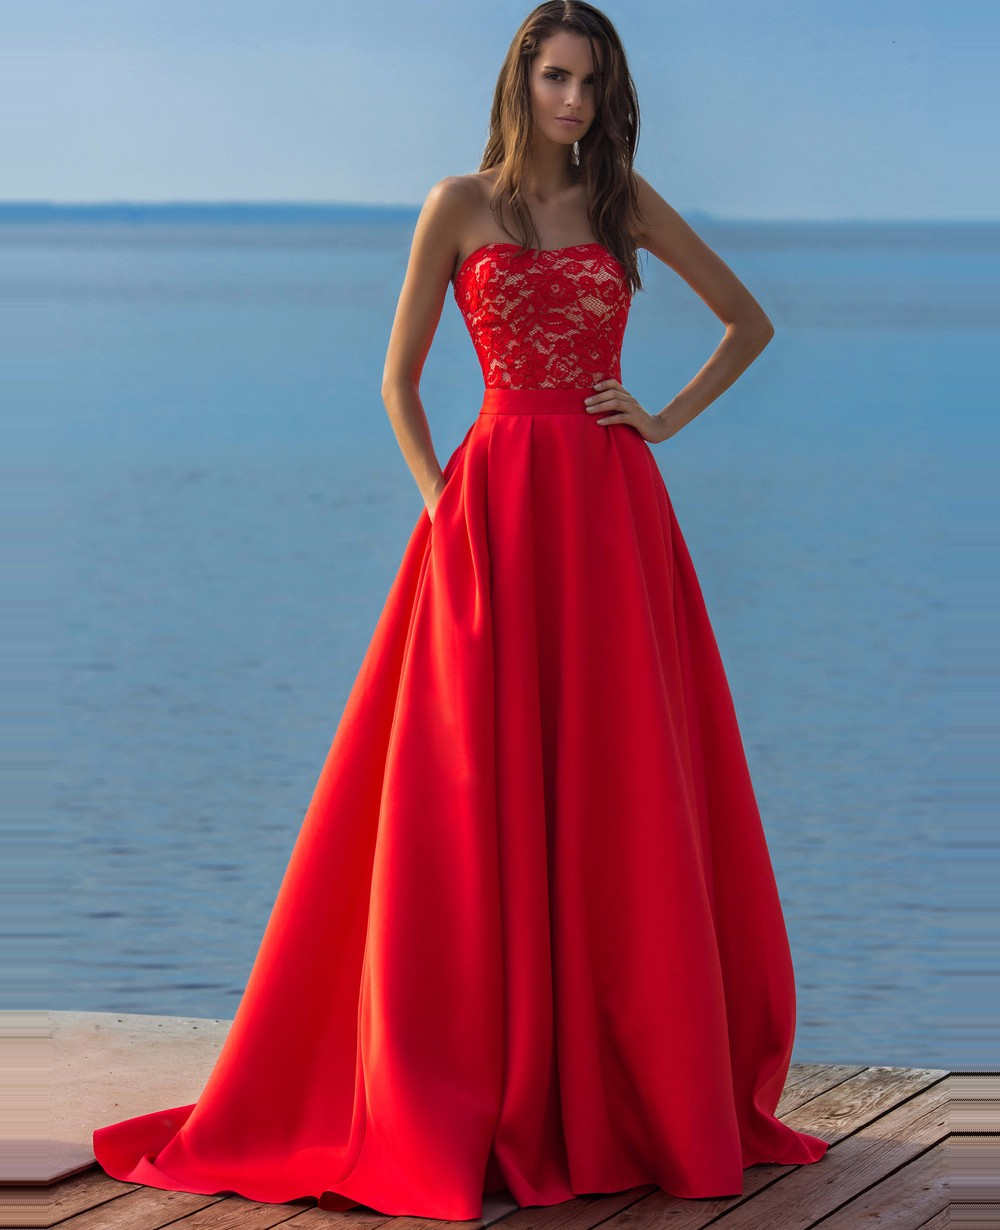 Deep Red Prom Dresses   Dress images